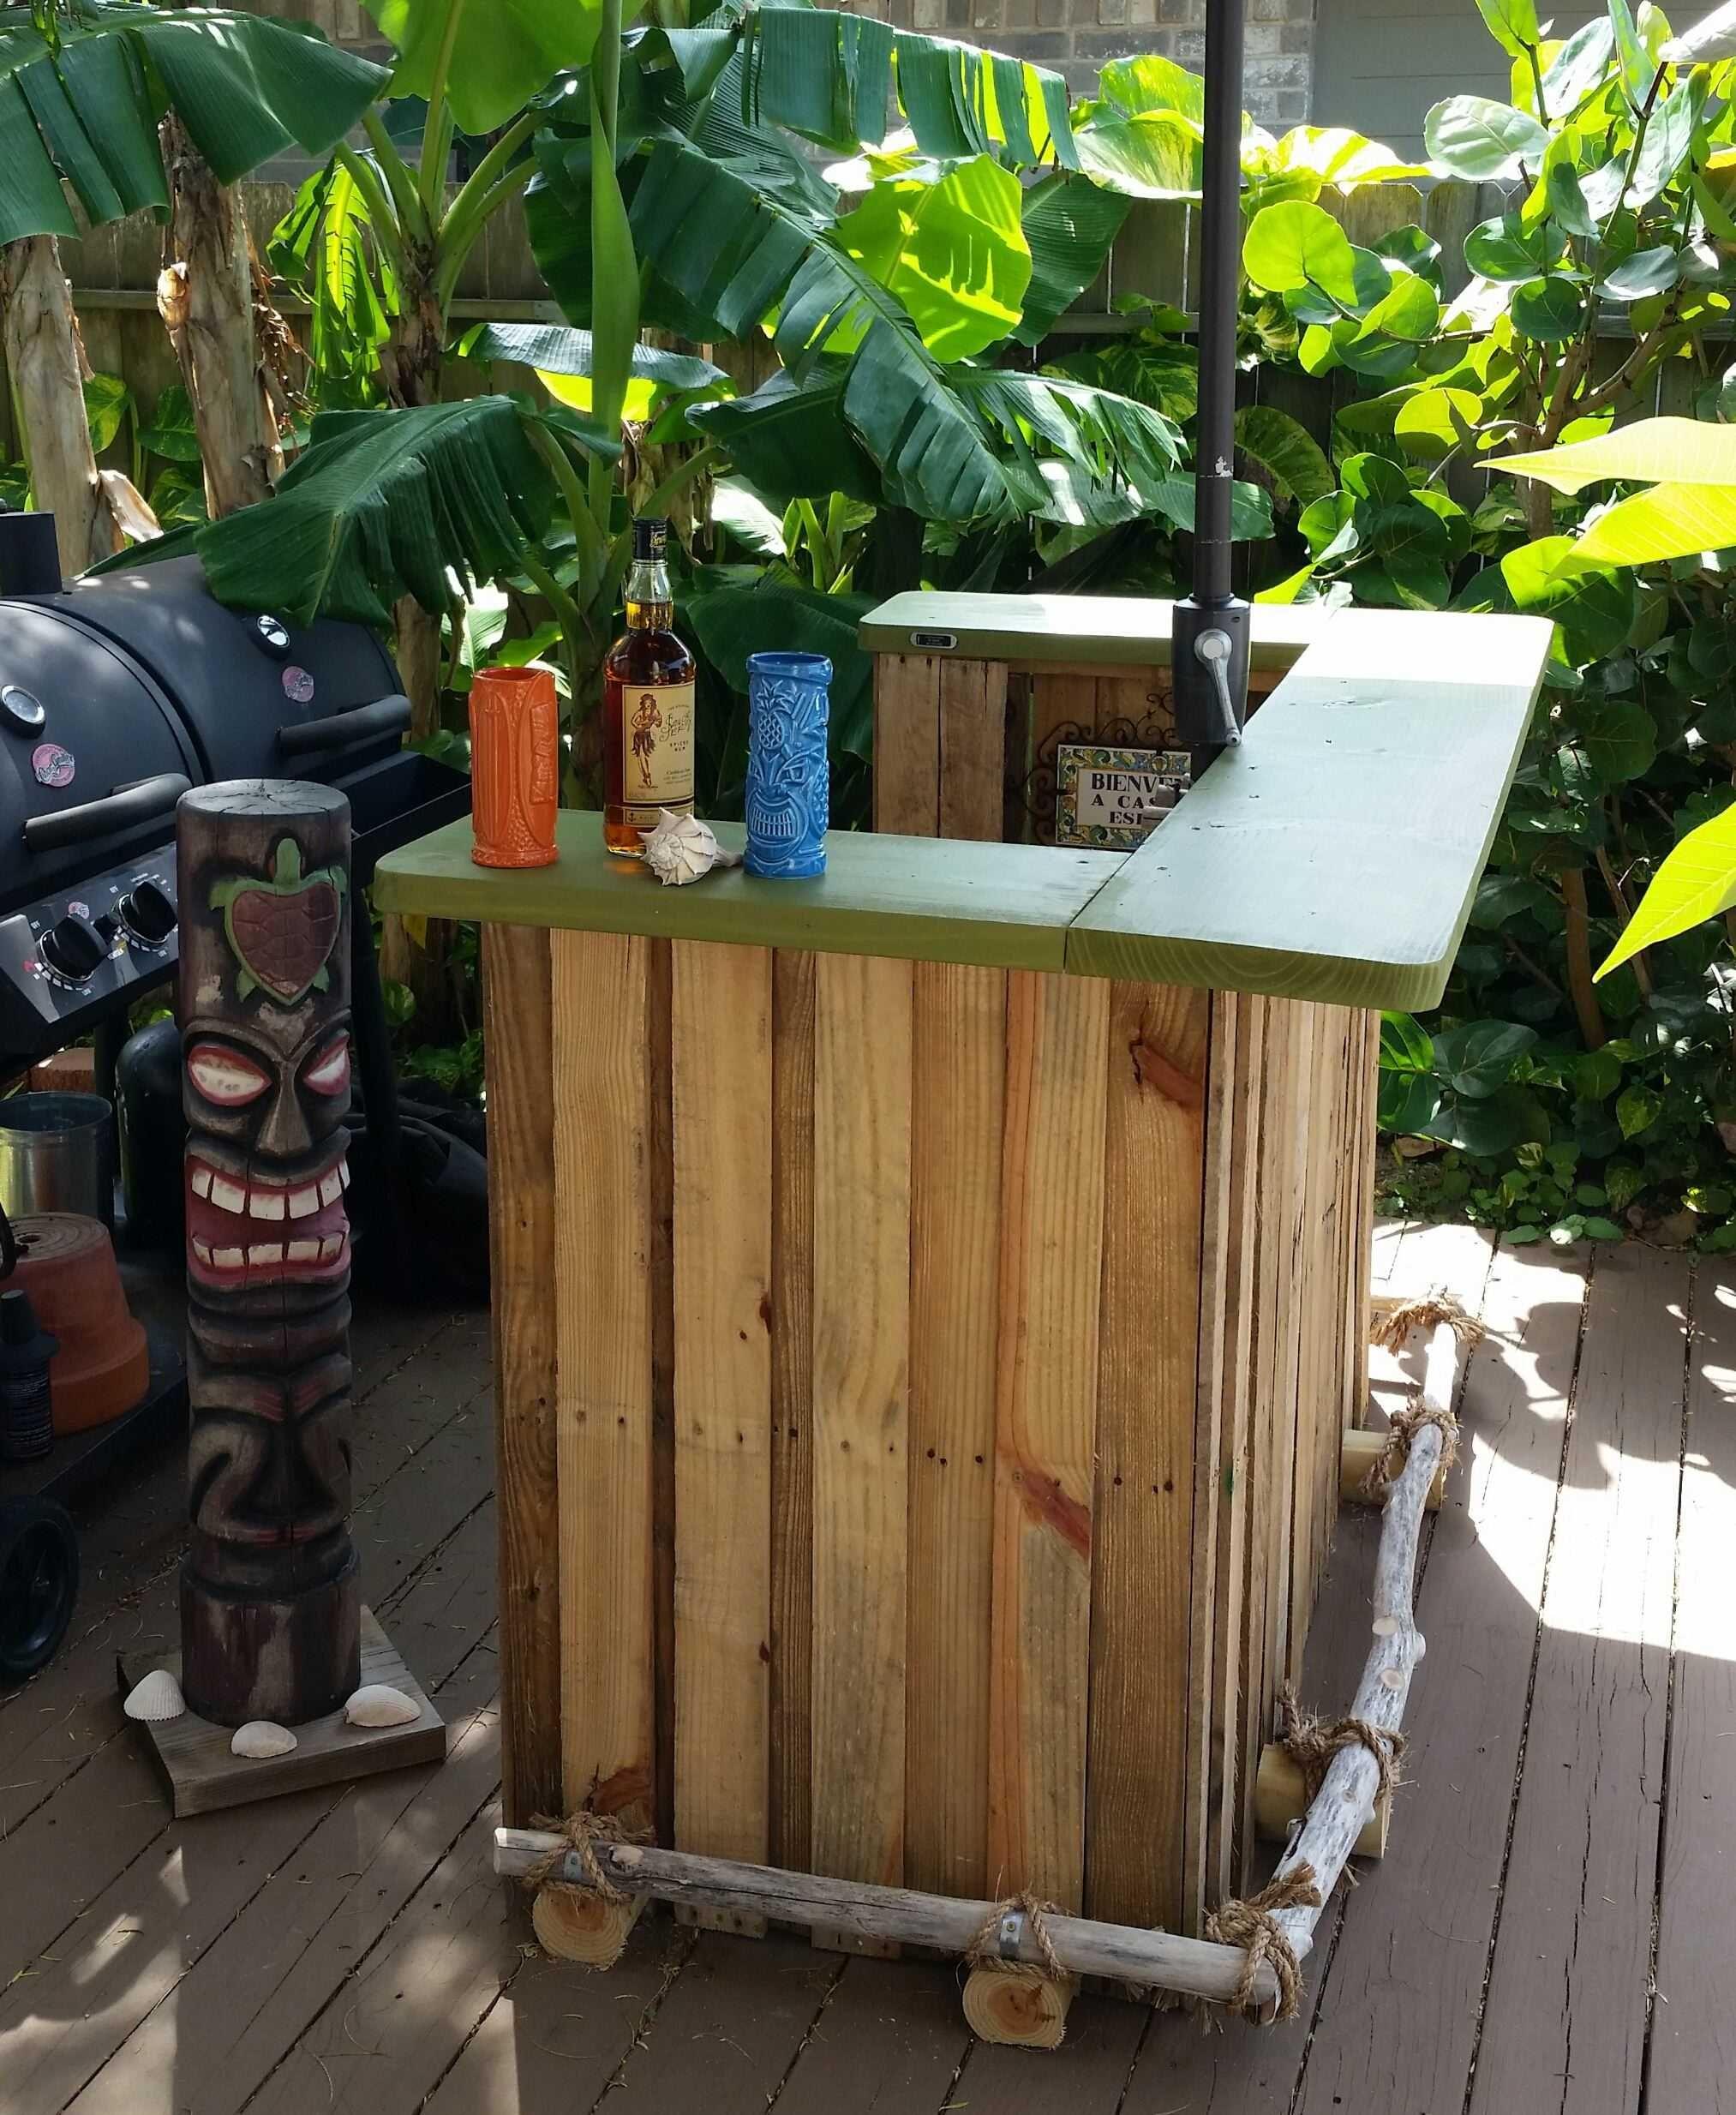 Backyard Bbq Tiki Bar   Pallet Re-purpose Projects   Pinterest